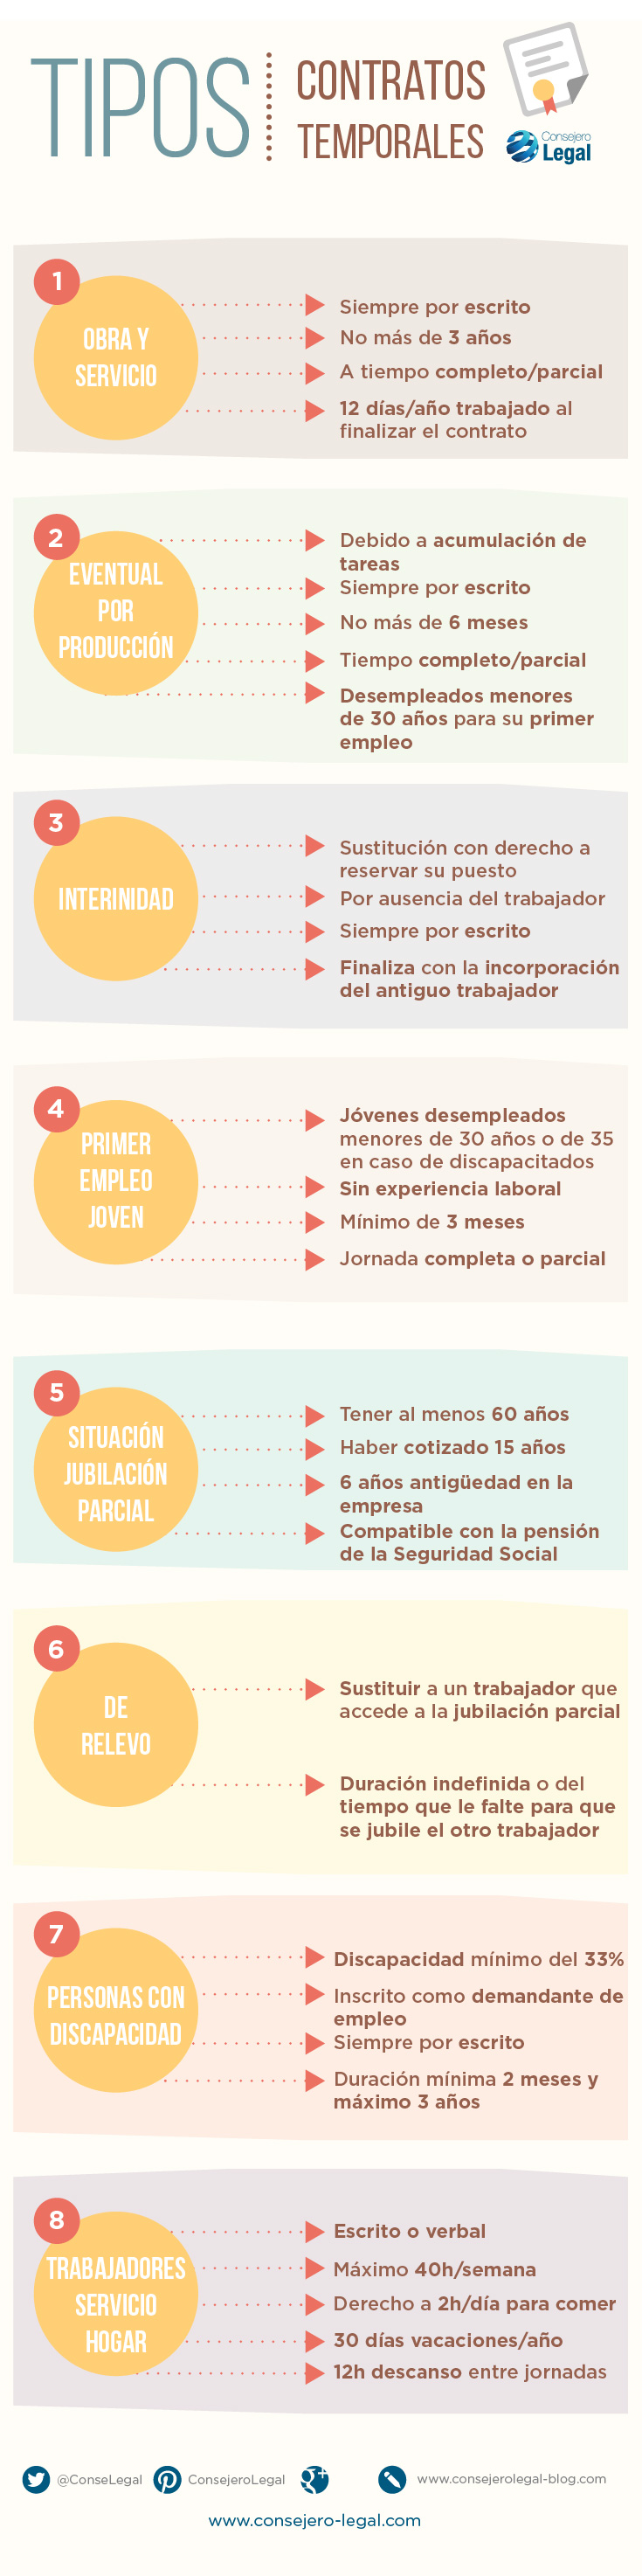 tipos de contratos temporales - Consejero Legal infografia